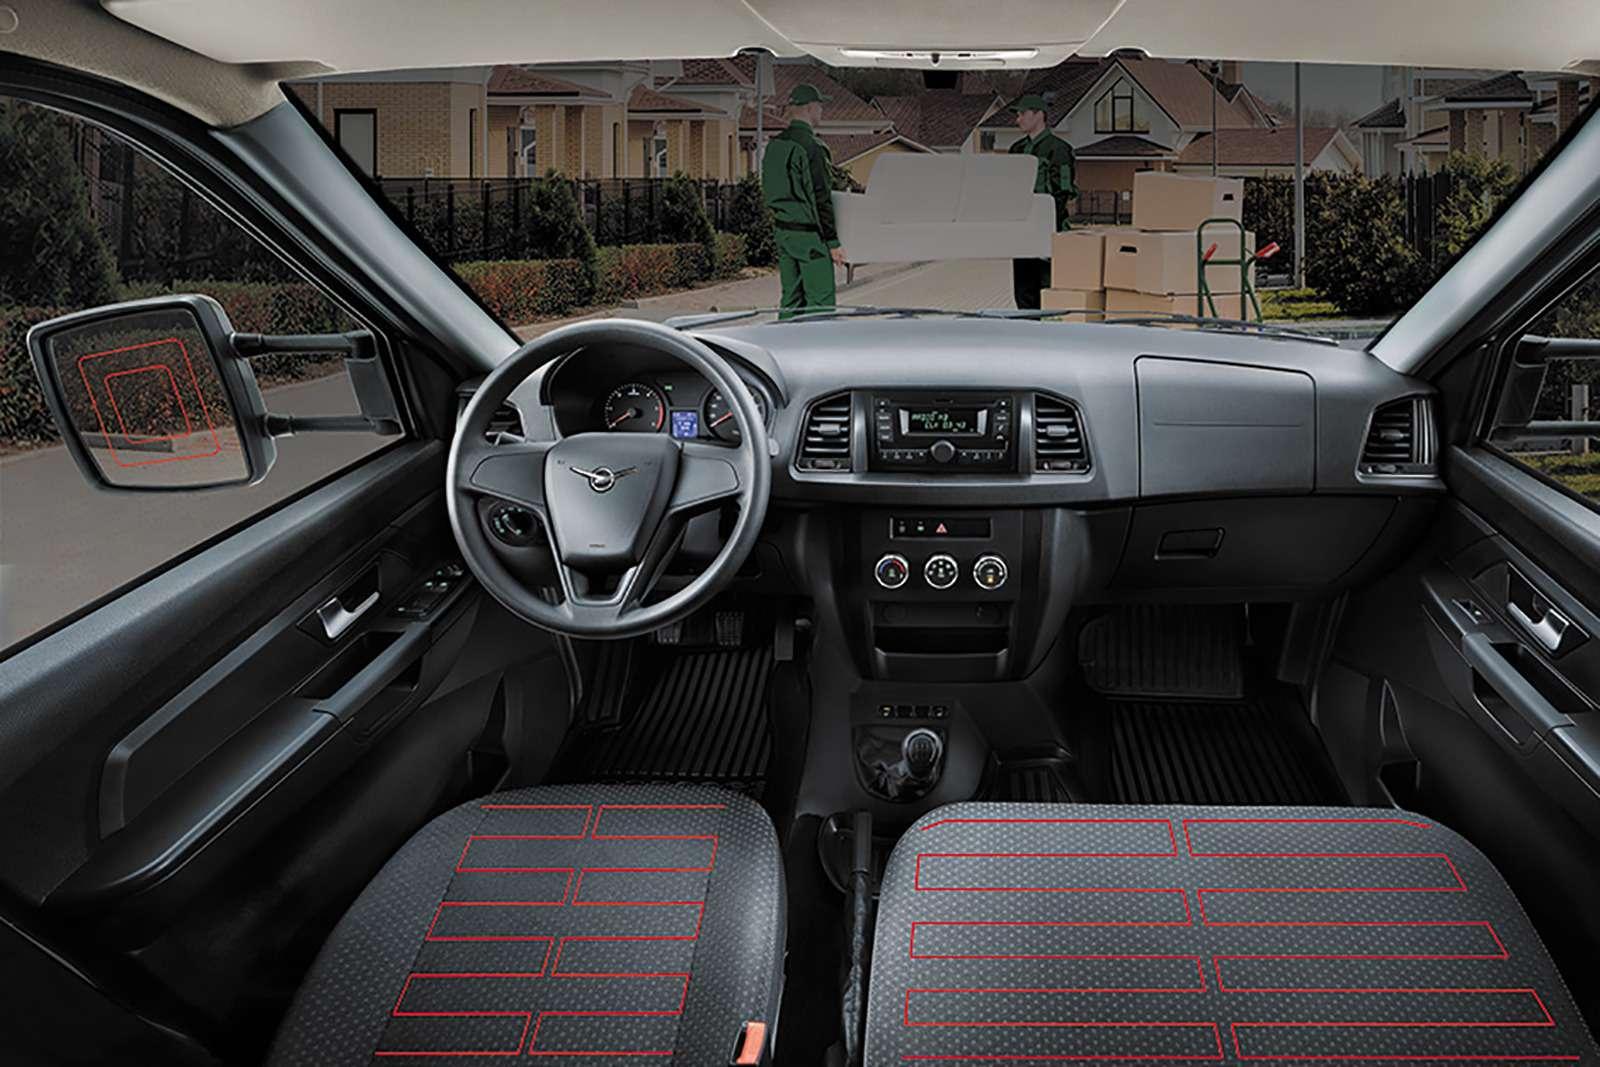 УАЗначал продажи конкурента ГАЗели Бизнес— фото 805871